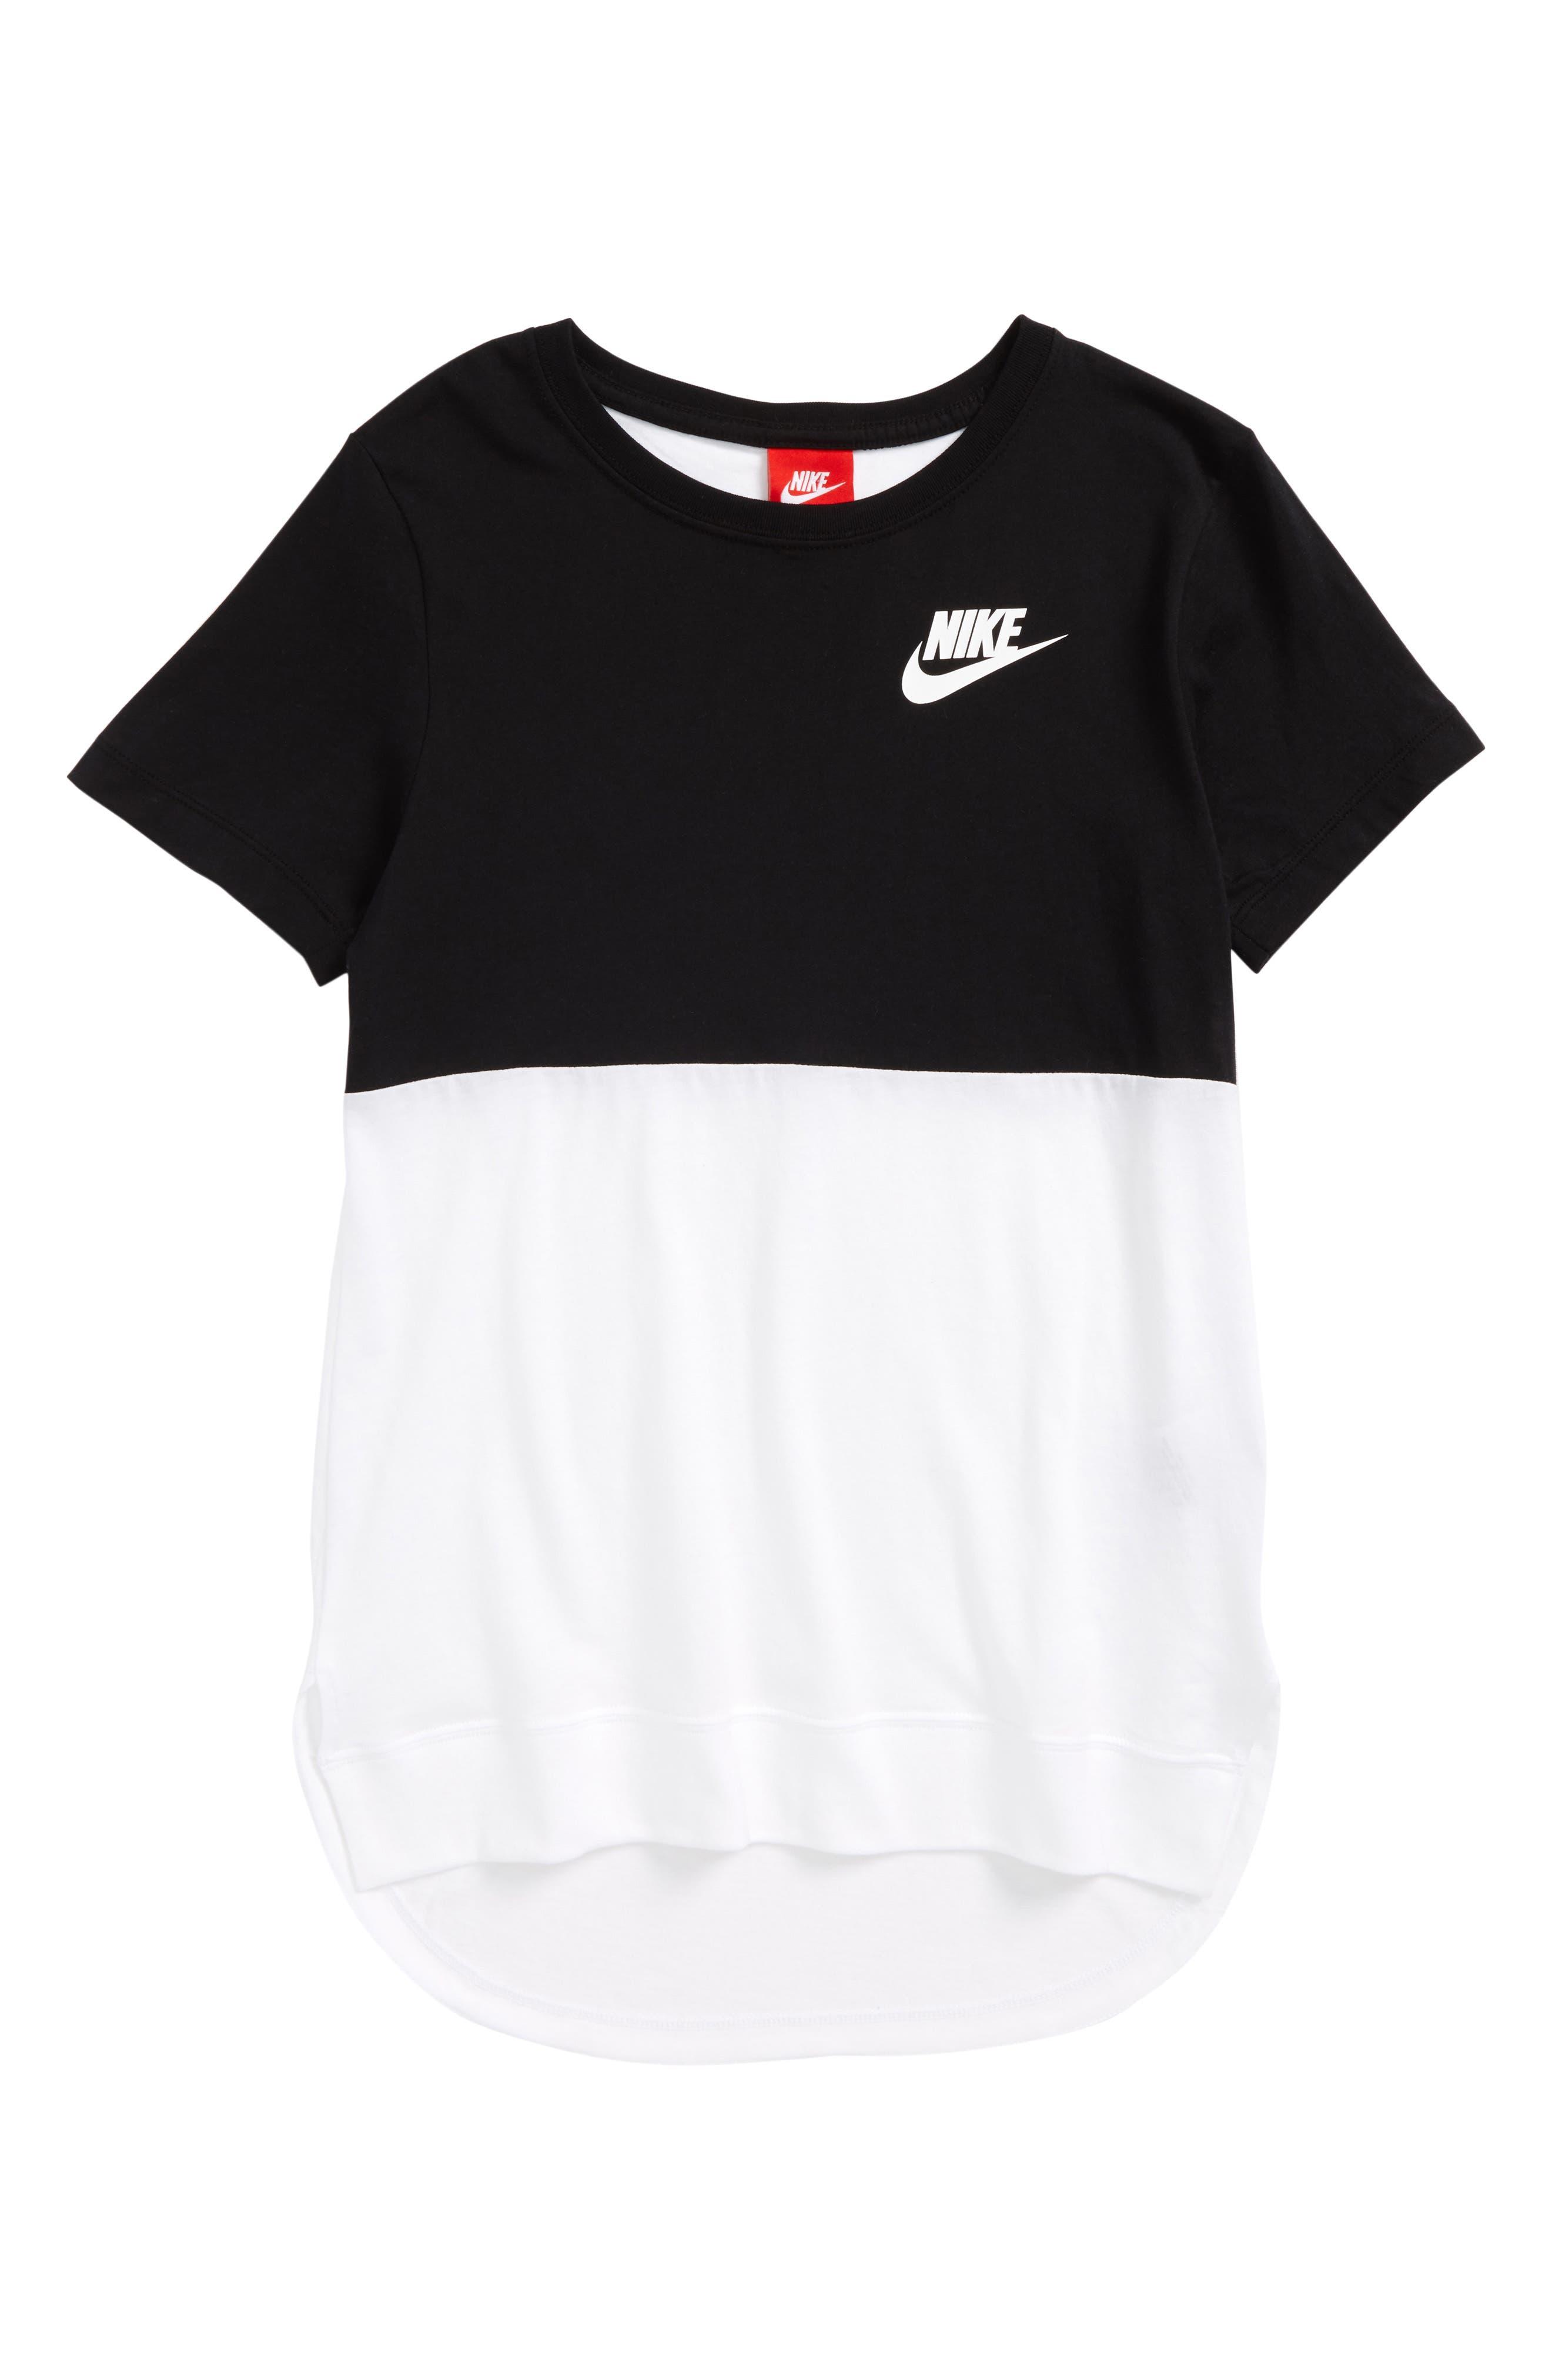 Alternate Image 1 Selected - Nike Sportswear Graphic Tee (Big Girls)